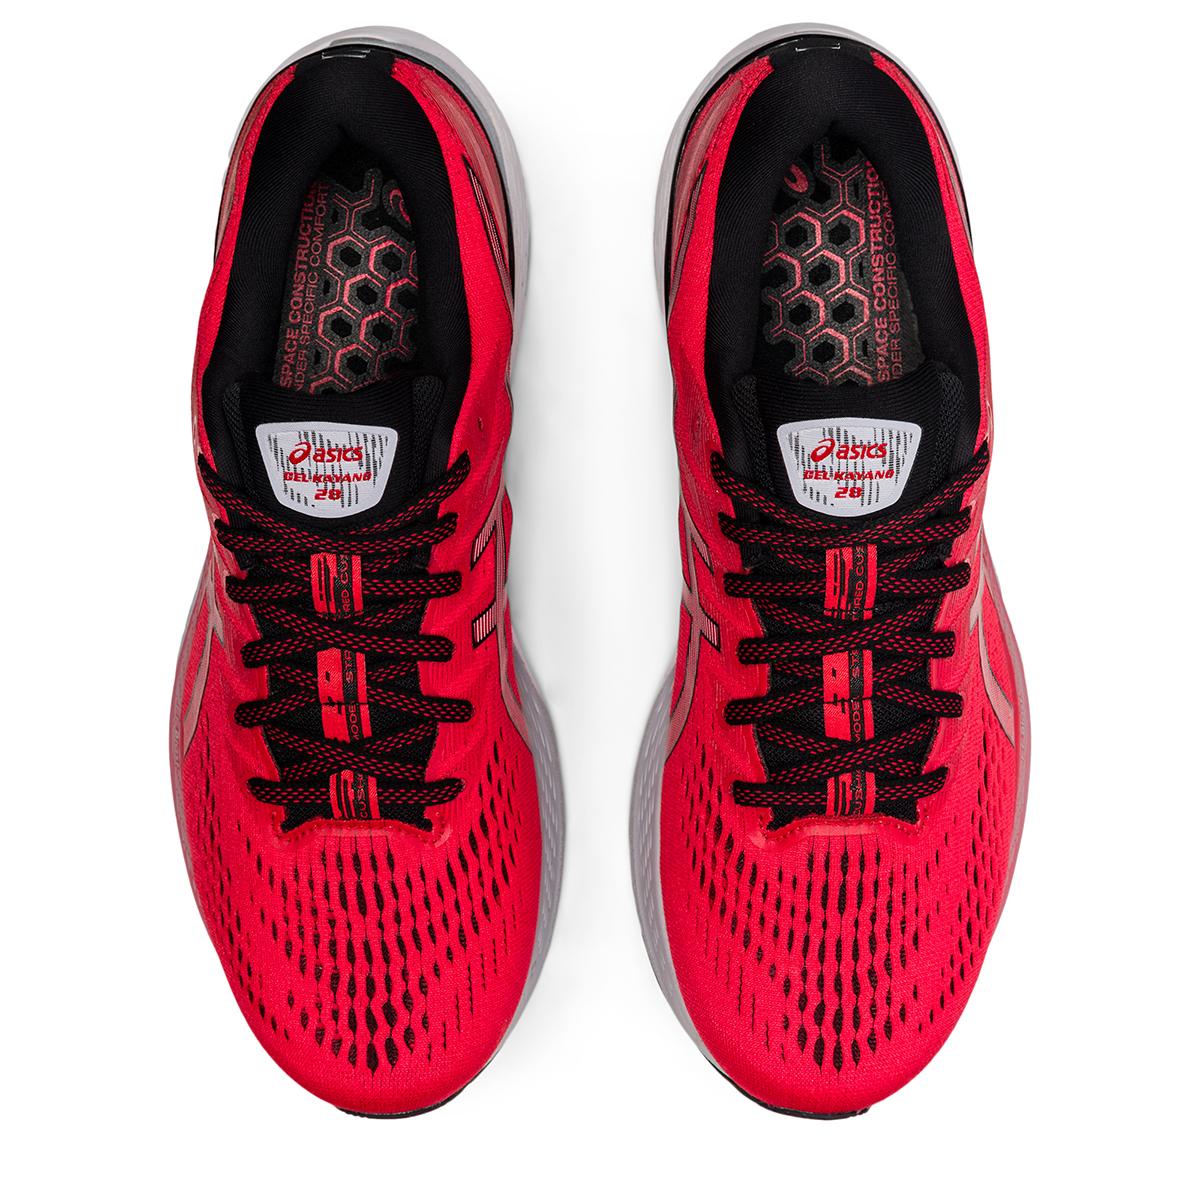 Men's Asics Gel-Kayano 28 Running Shoe - Color: Electric Red - Size: 7 - Width: Regular, Electric Red, large, image 3